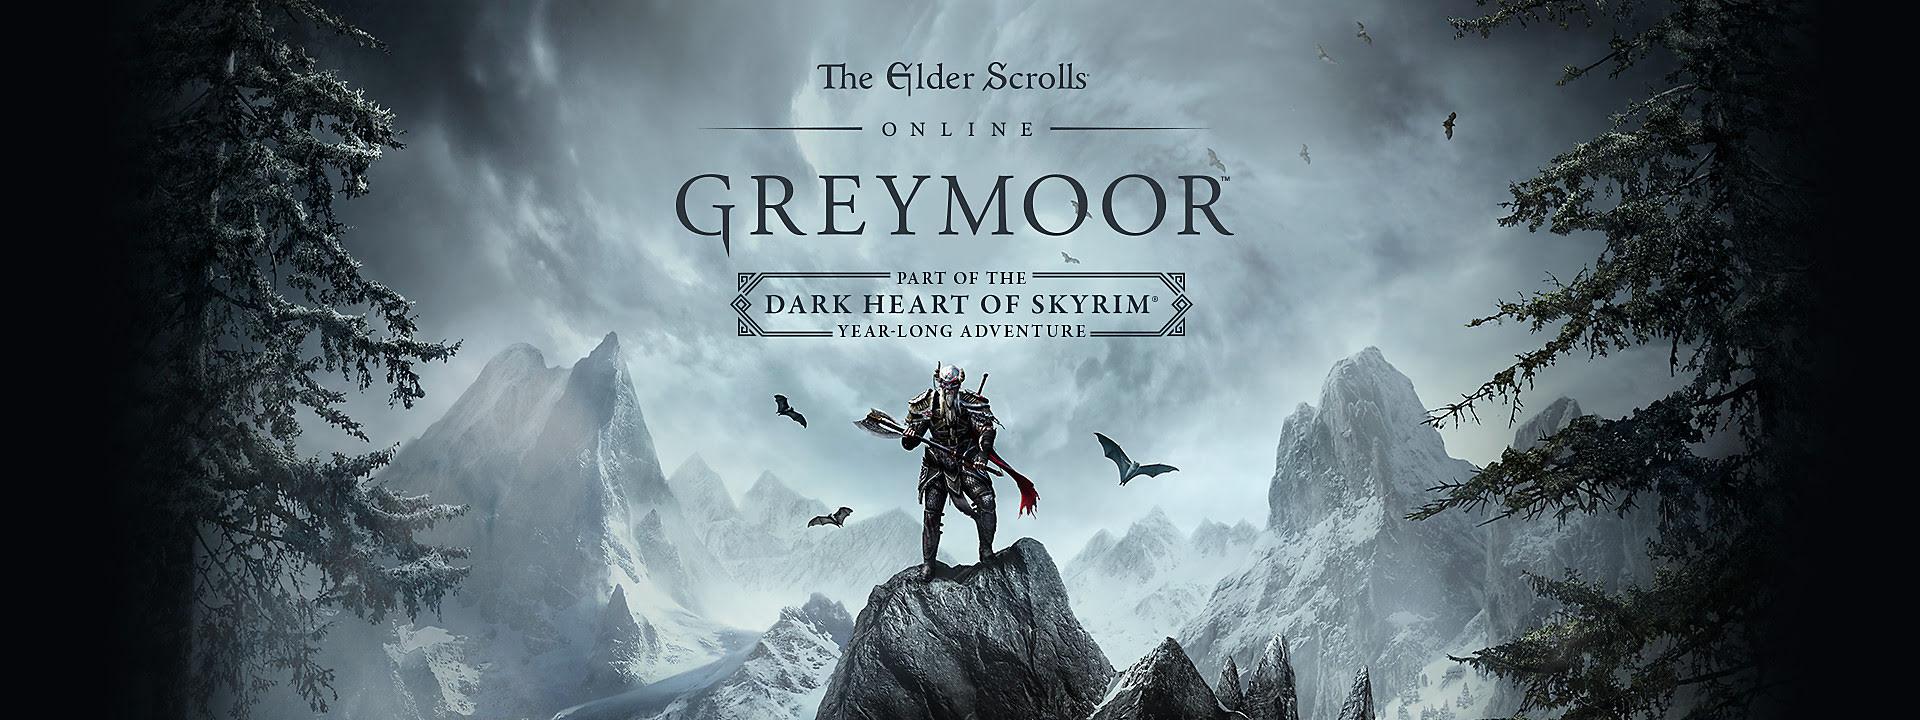 The Elder Scrolls Online: Greymoor уже доступна на русском языке!